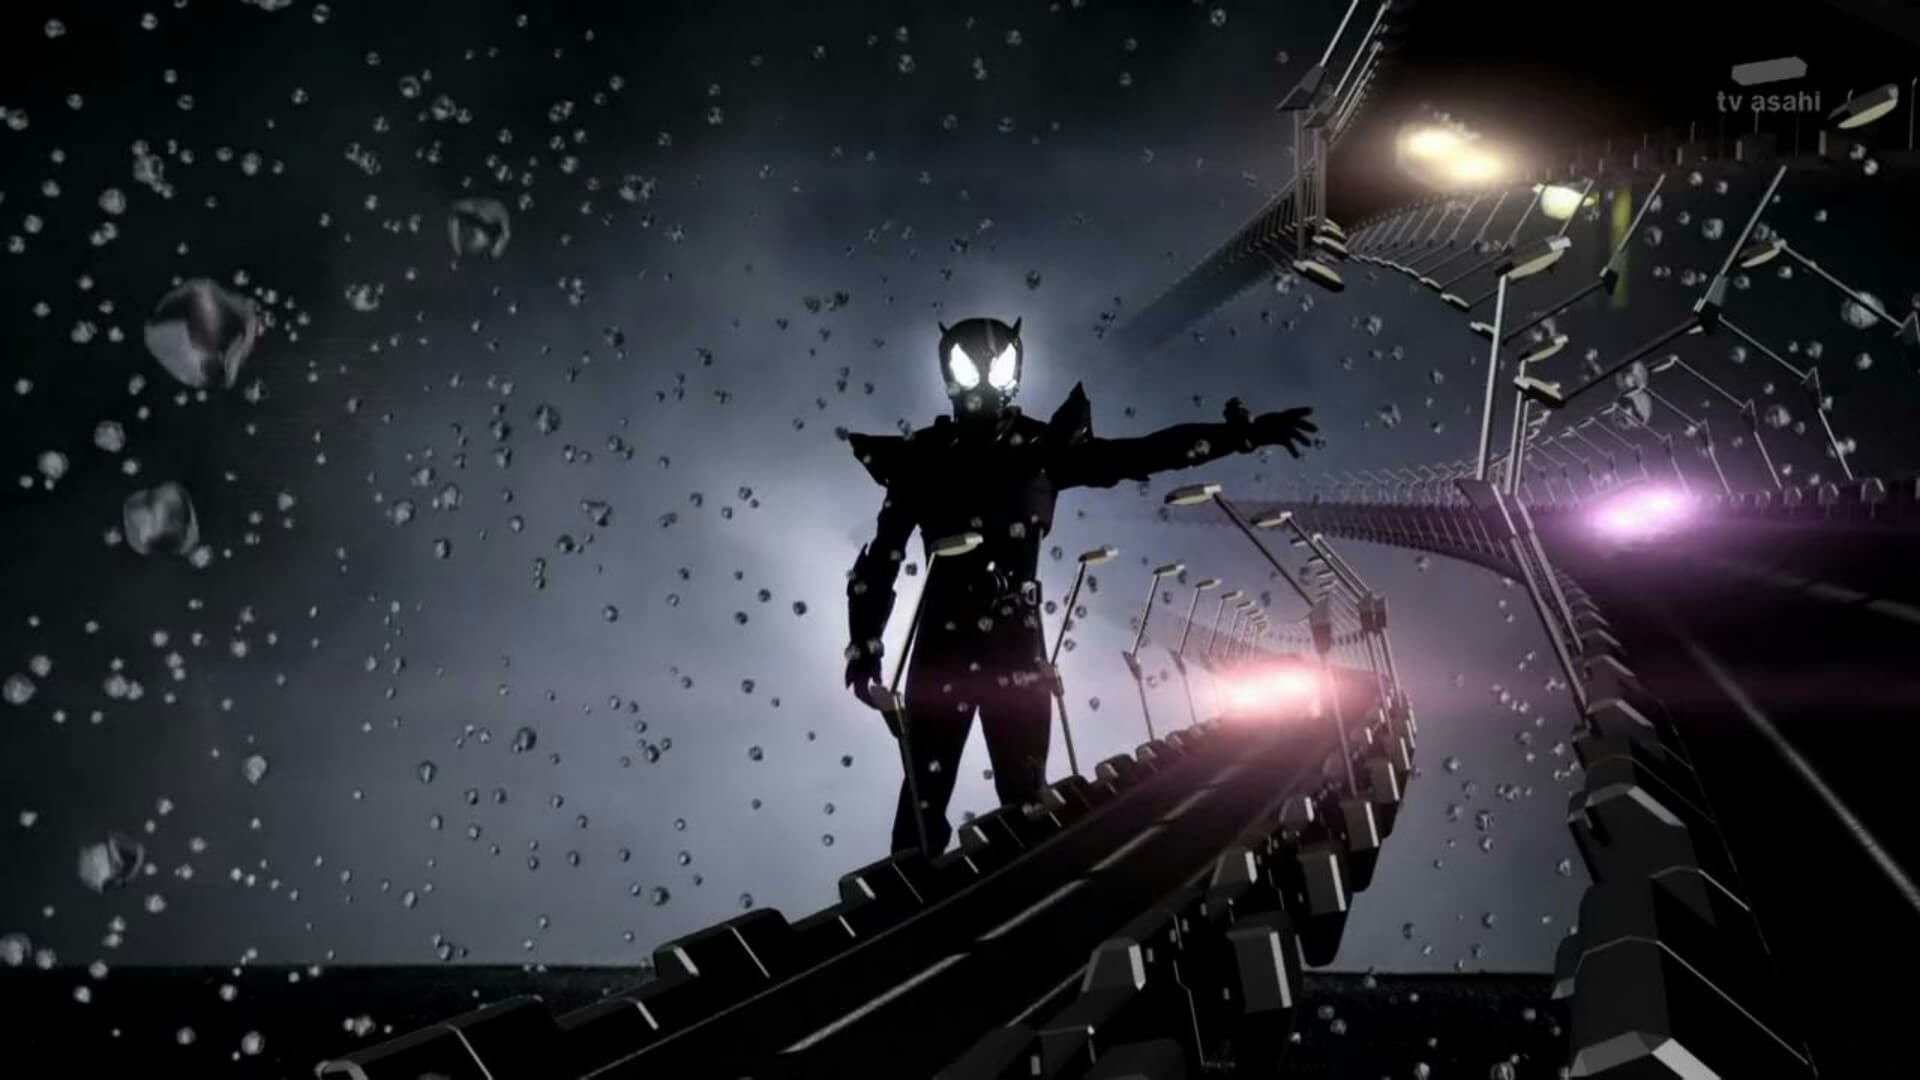 Kamen Rider - Kamen Rider Zi-O